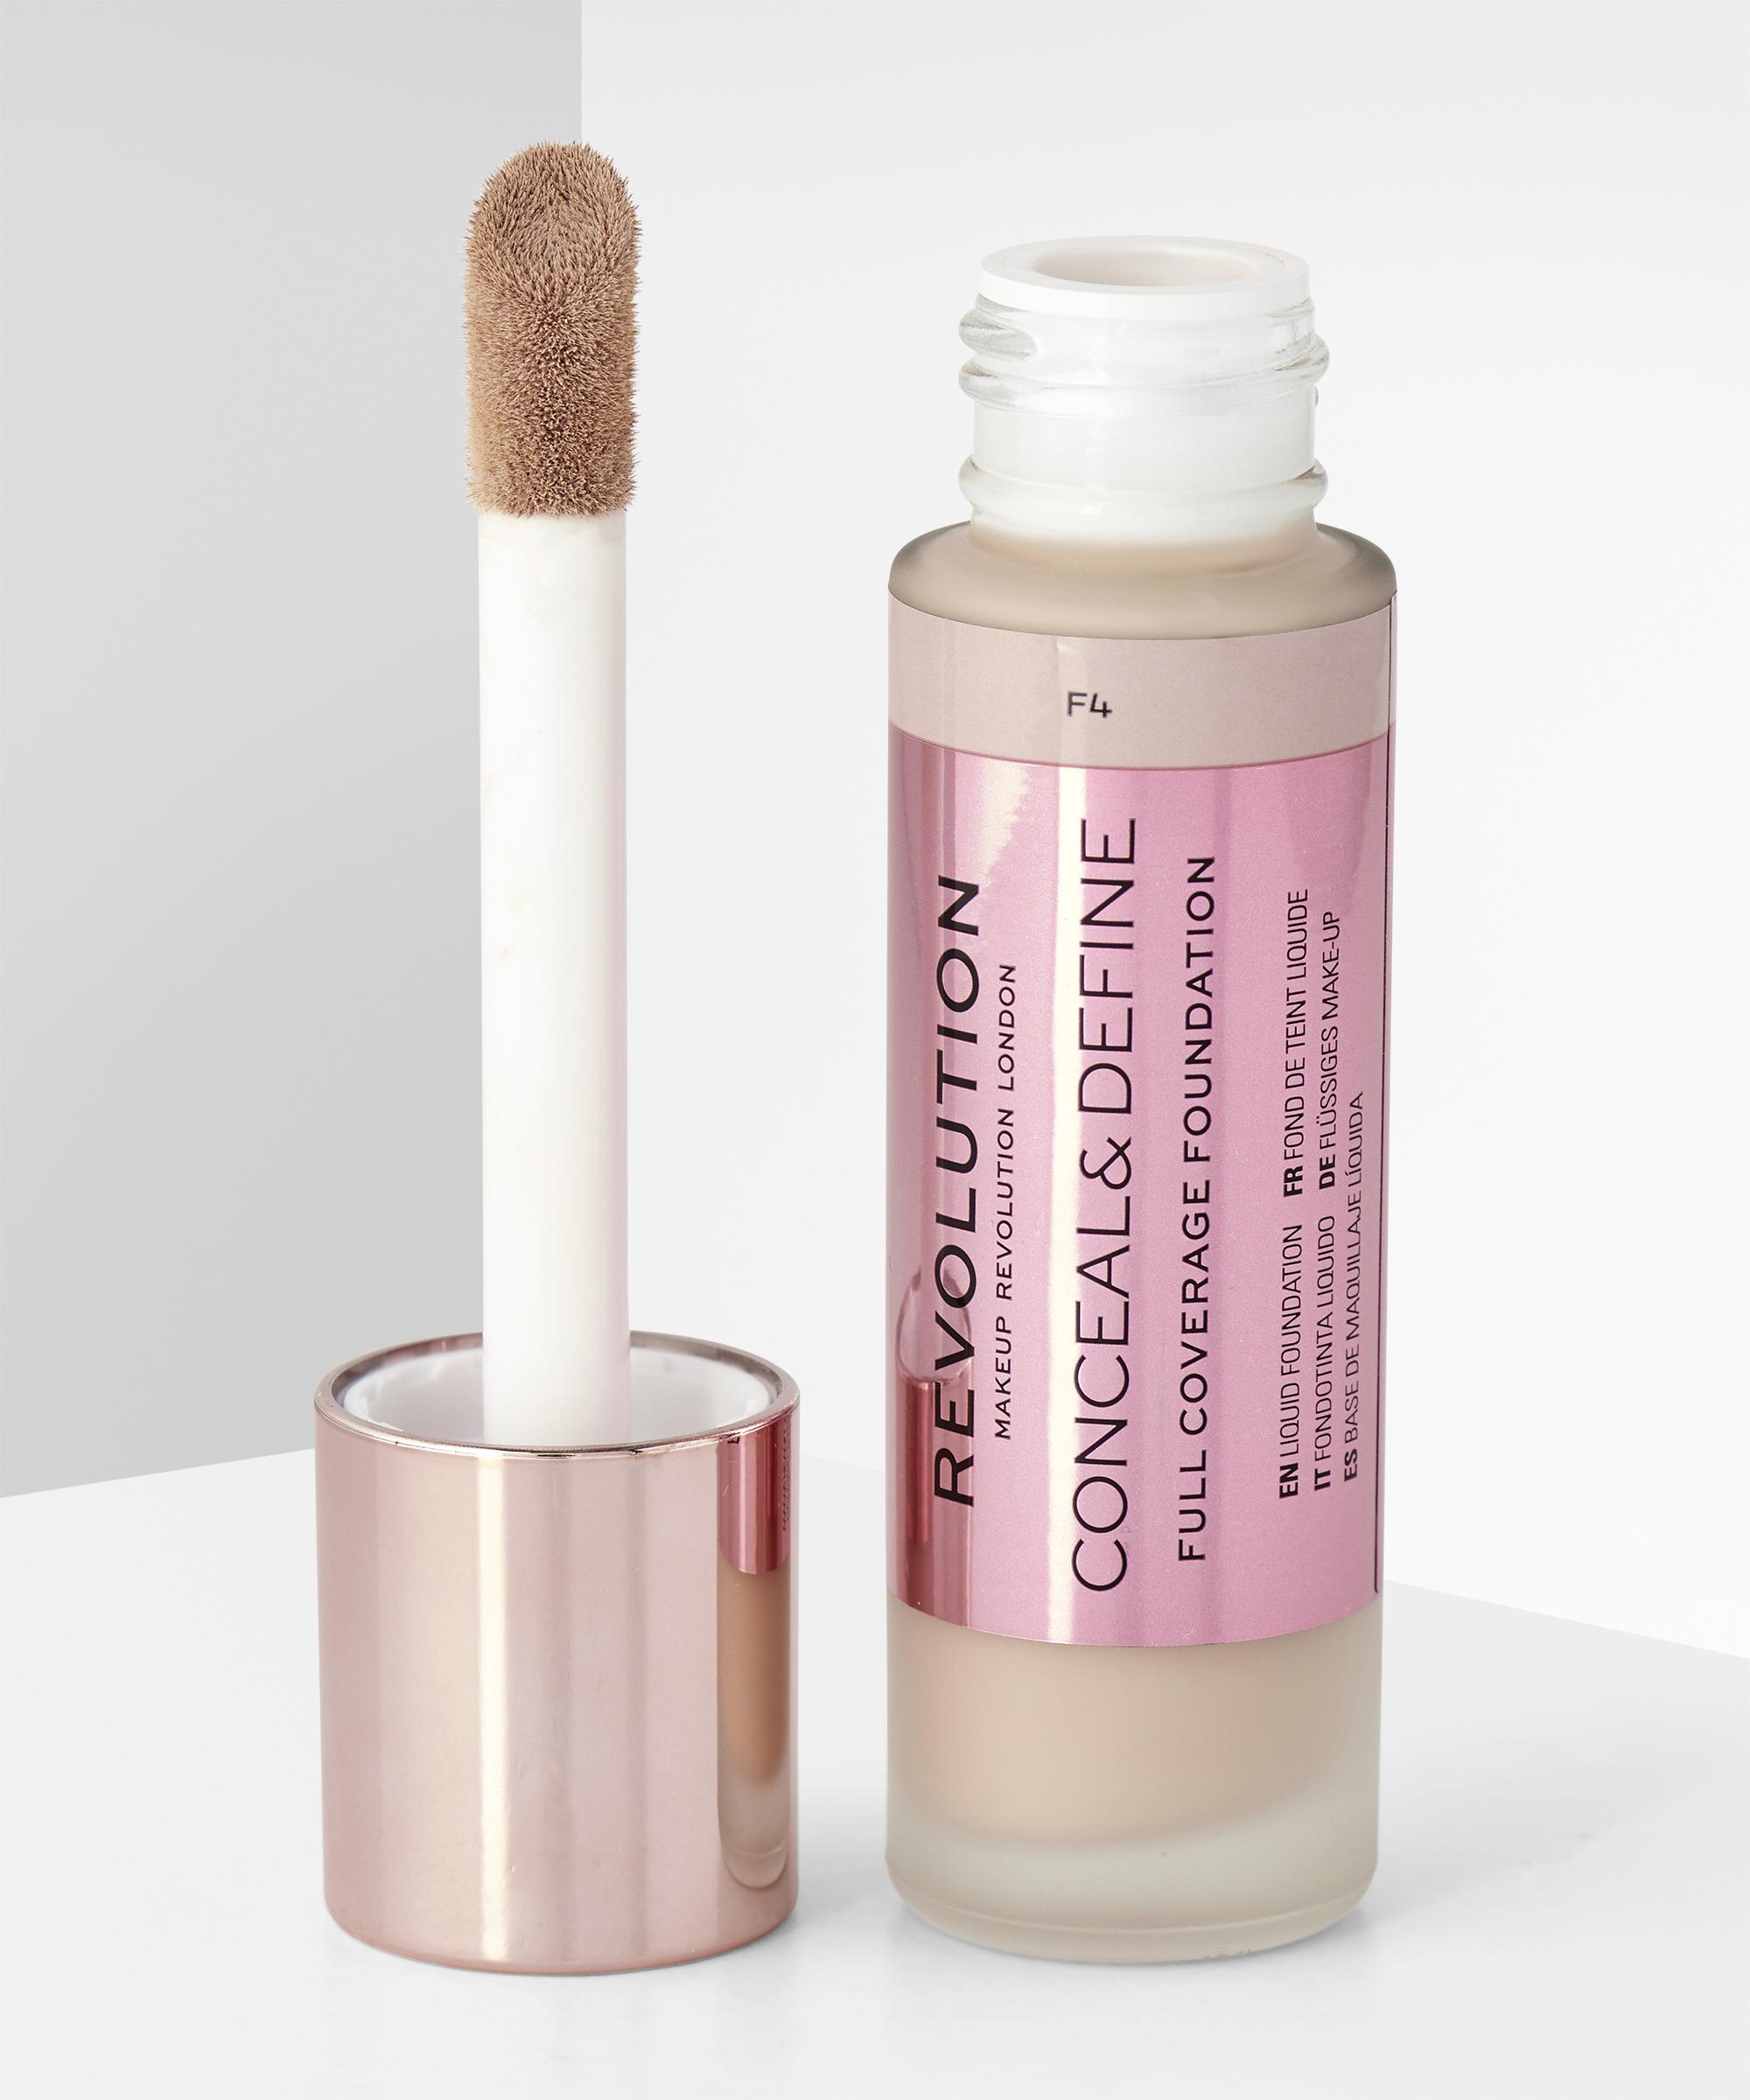 Makeup Revolution Conceal Define Foundation F4 At Beauty Bay